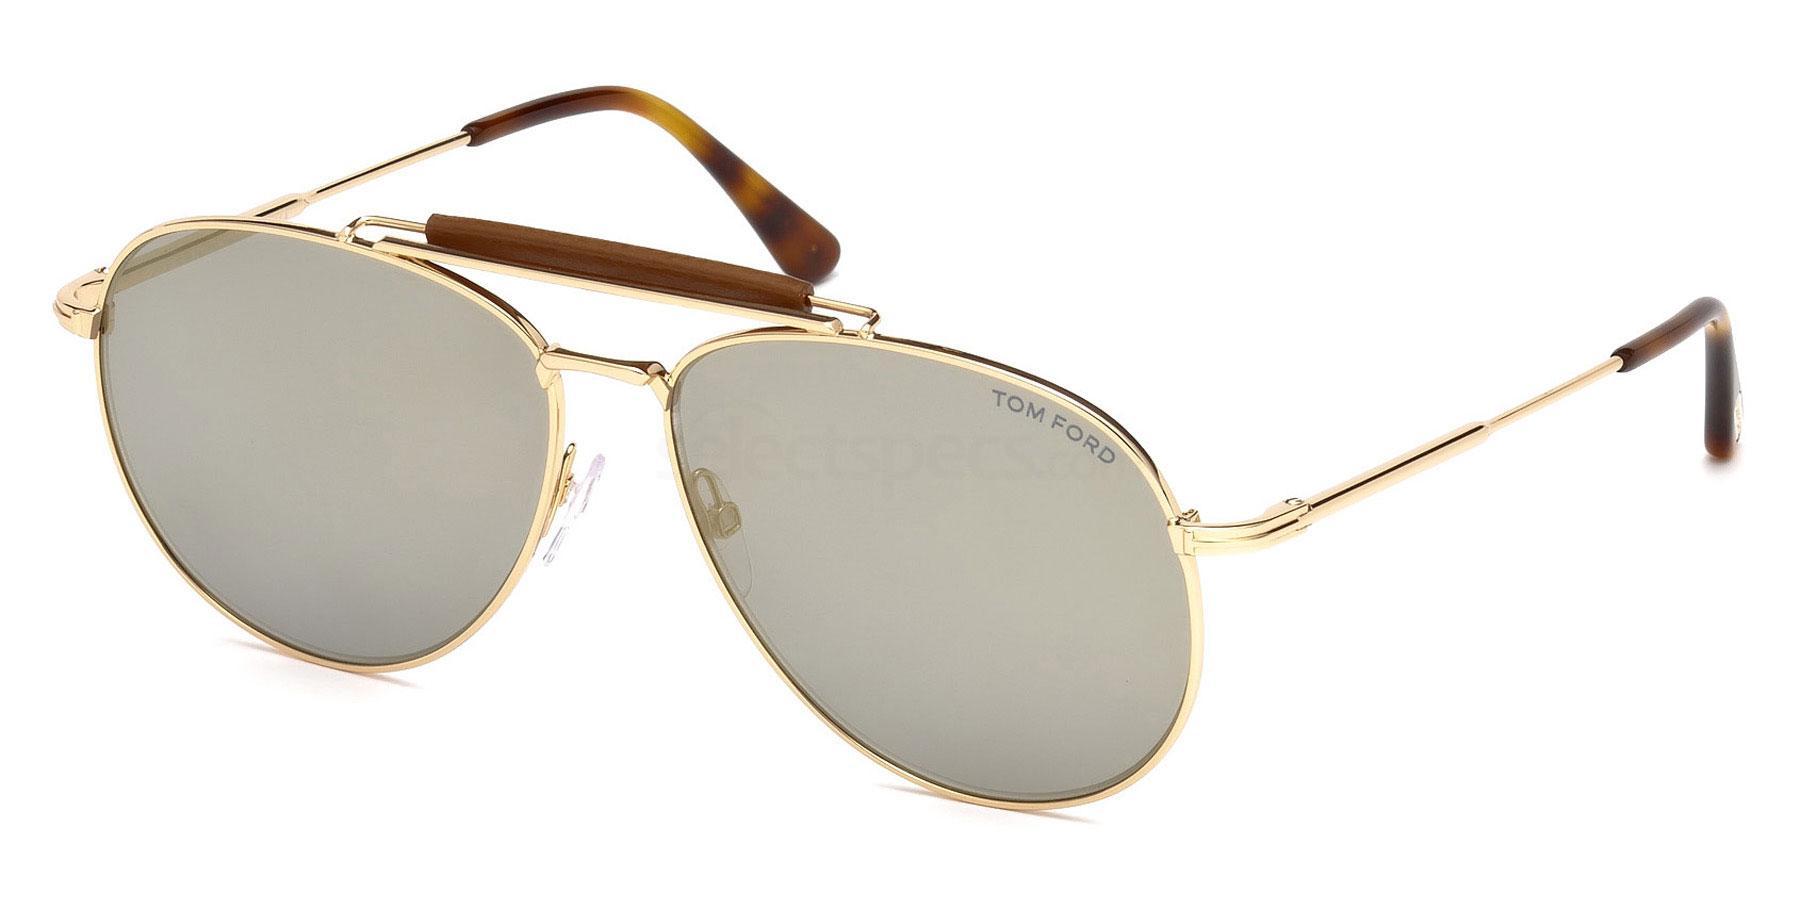 28C FT0536 Sunglasses, Tom Ford